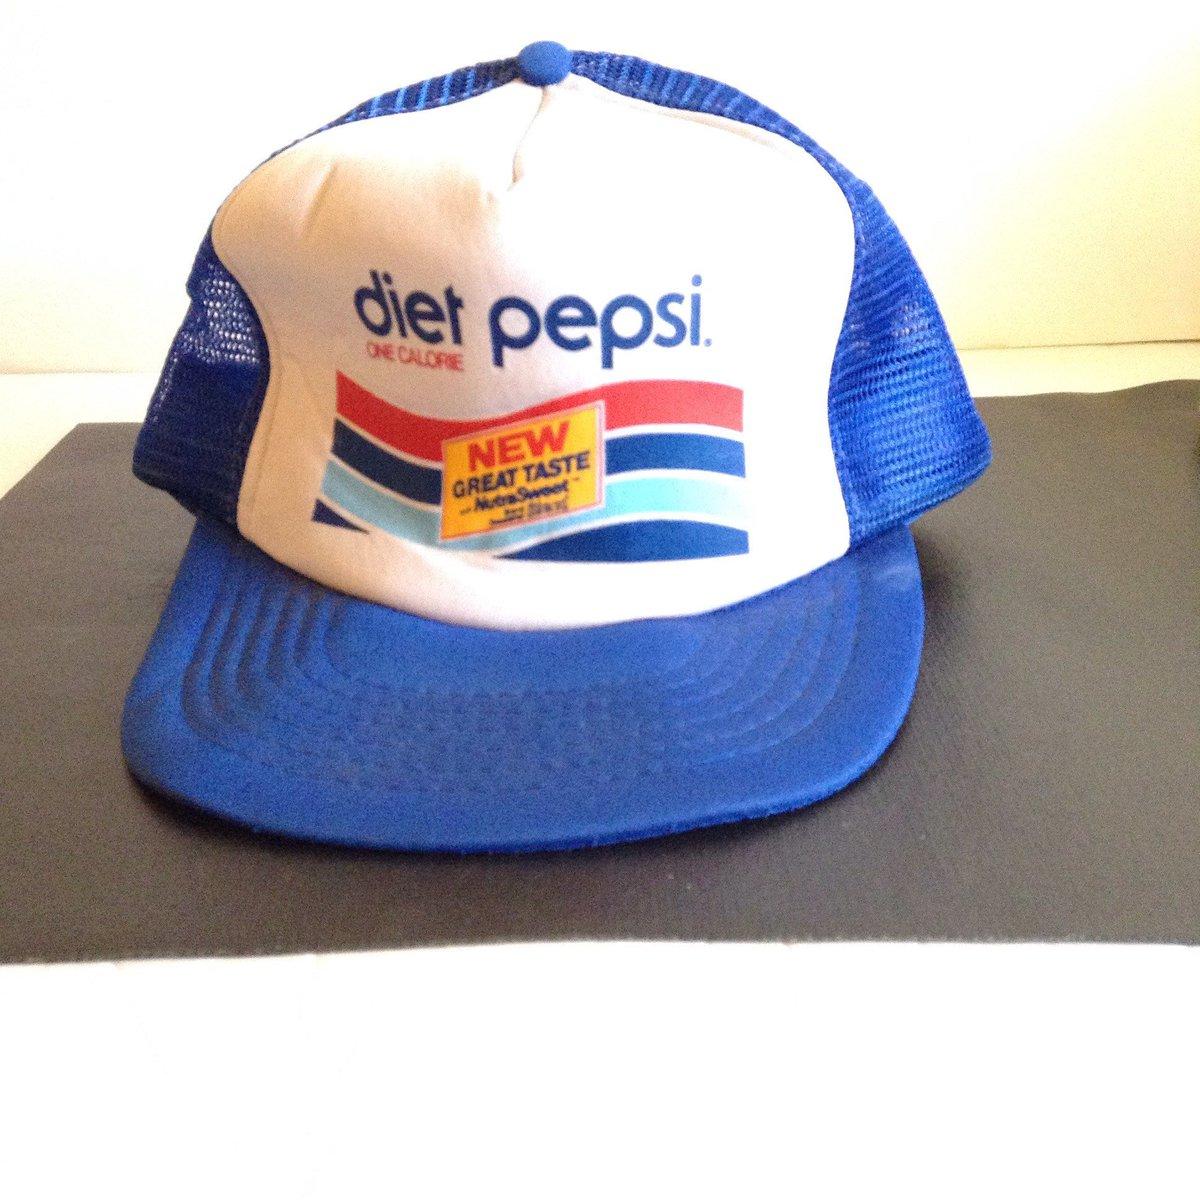 ... Vintage DIET PEPSI Nutra Sweet Snapback Trucker Hat Red White Blue c8759e417977